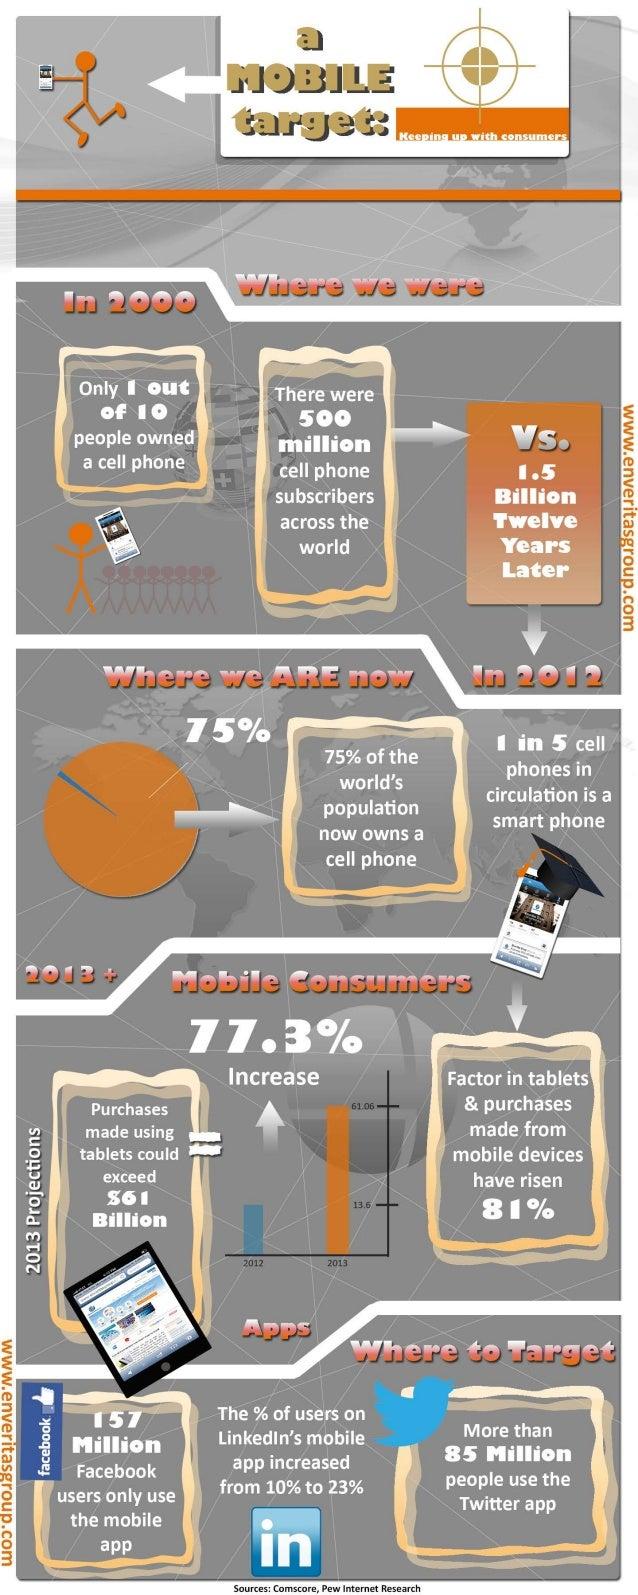 Mobile Website and App Statistics